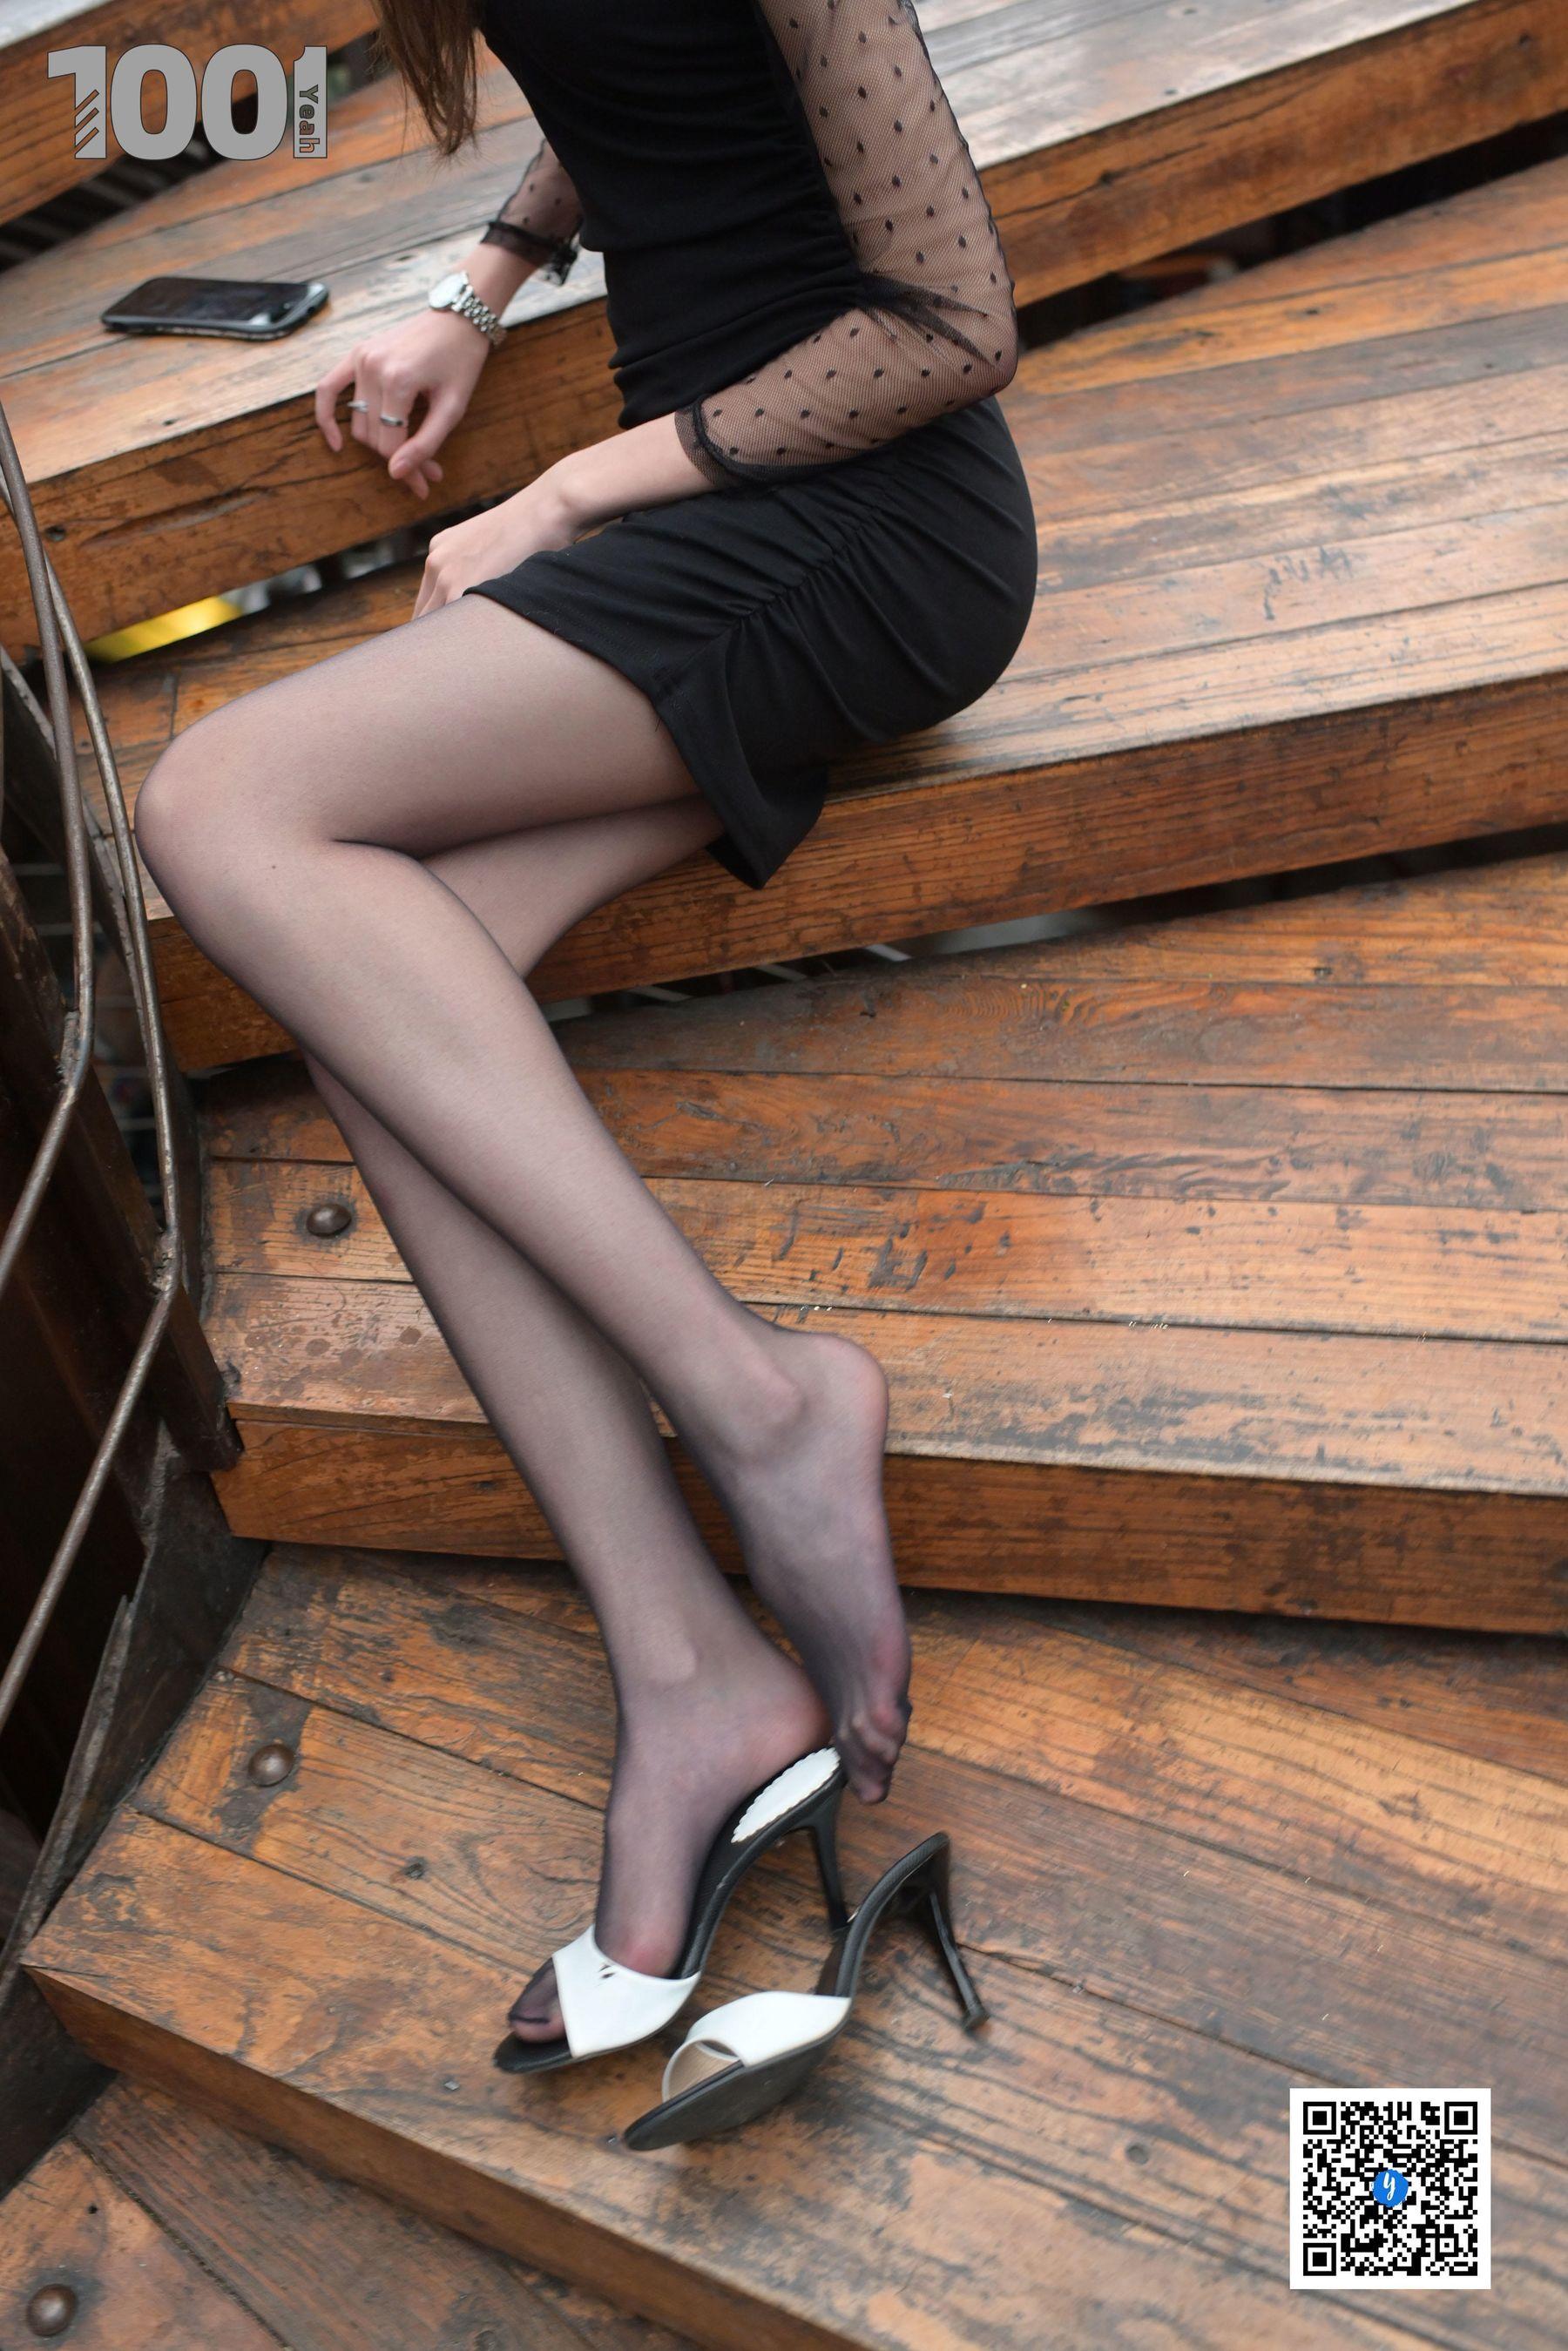 [IESS] NO.185 草莓《楼梯的拐角处2》 丝袜美腿写真[70P]插图(10)